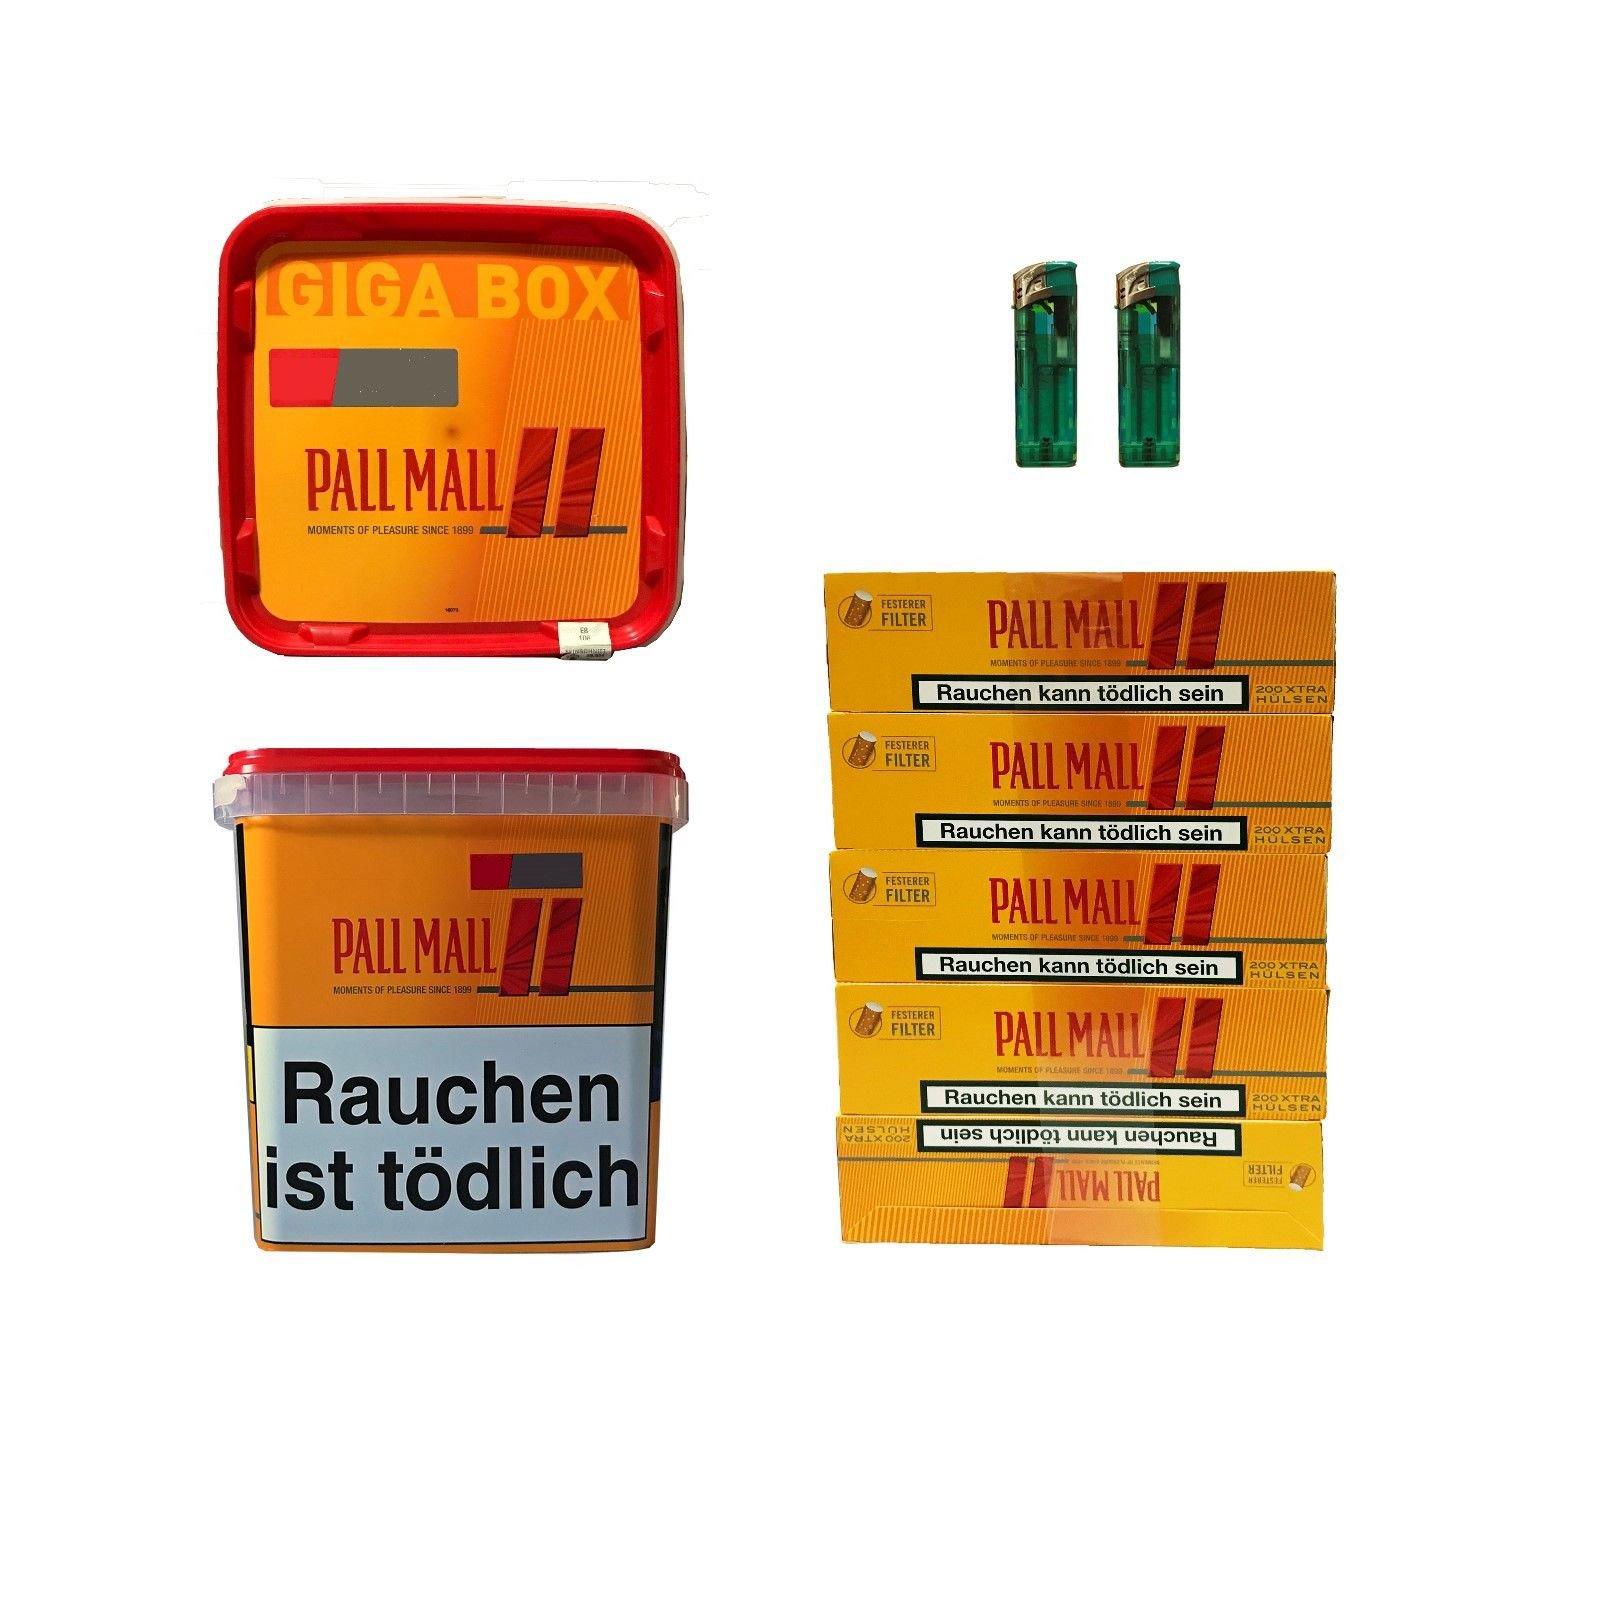 2x Pall Mall Allround Volumentabak Giga Box 260g, 1000 Extra Hülsen, 2 Feuerz.